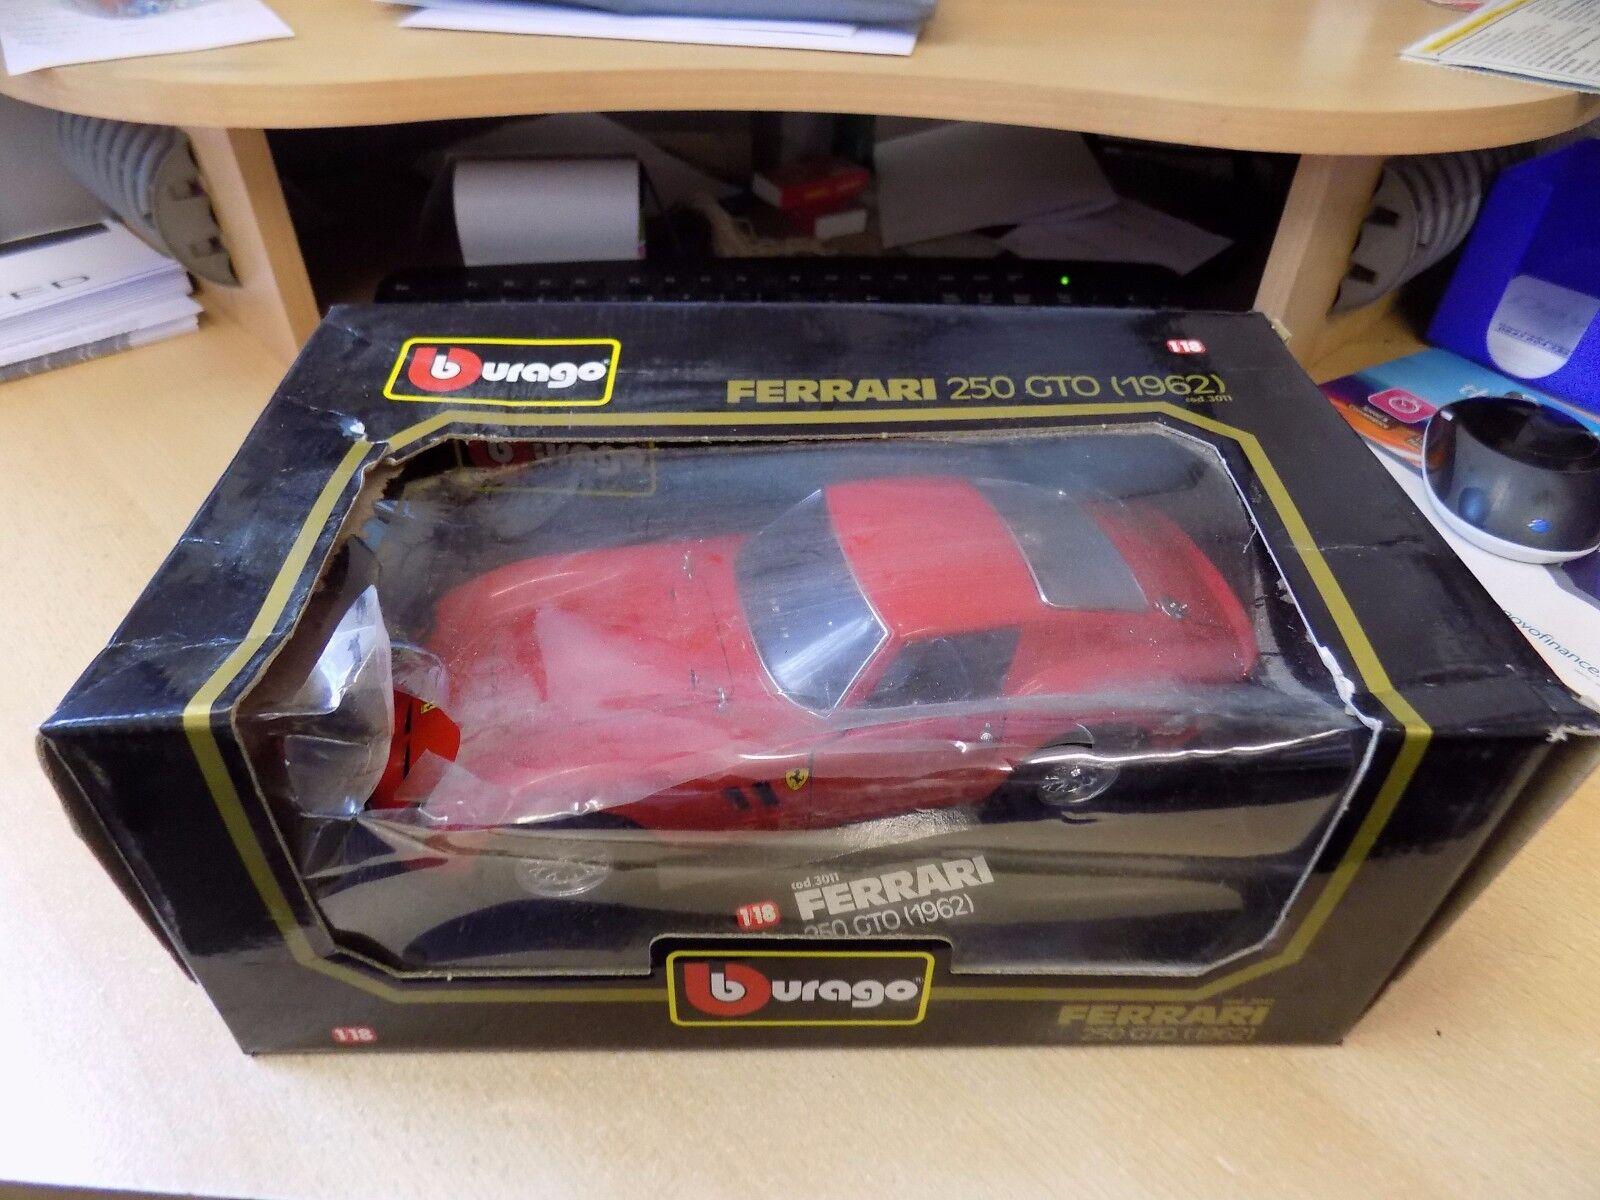 BBURAGO BURAGO 1 18 modellololo FERRARI 250 GTO 1962 cod. 3011